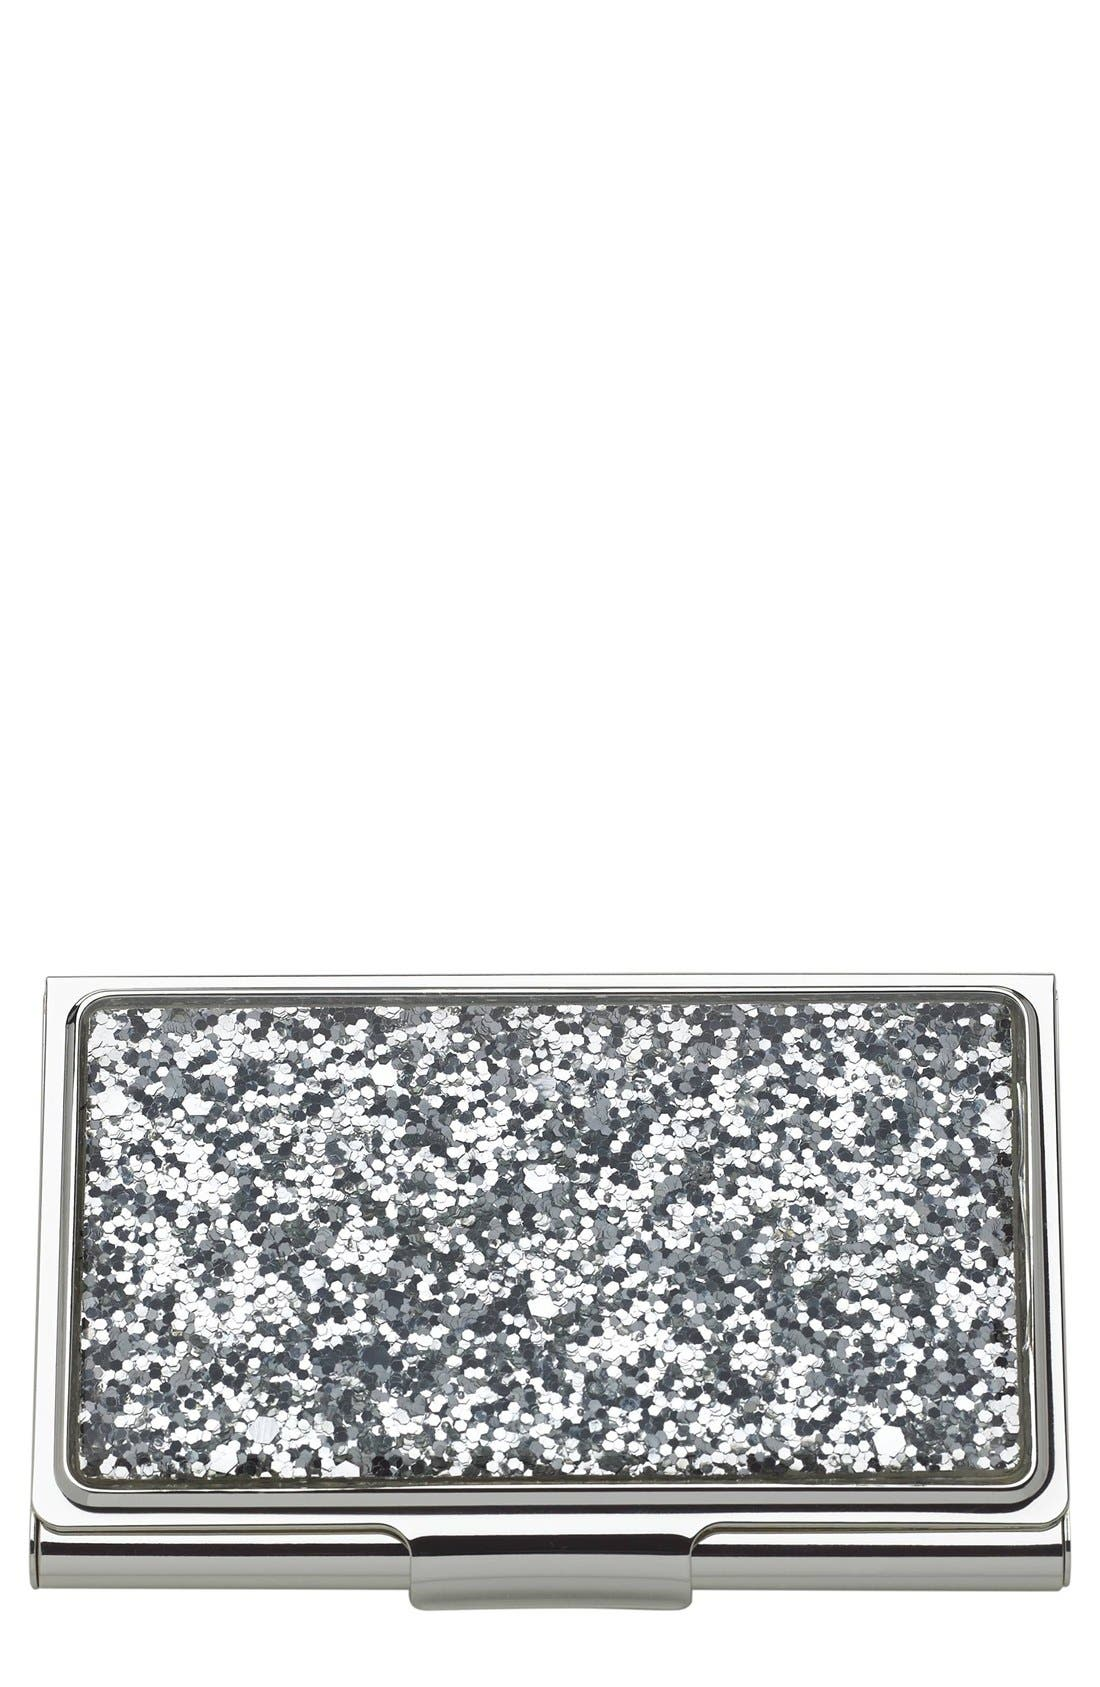 KATE SPADE NEW YORK,                             glitter business card holder,                             Main thumbnail 1, color,                             046